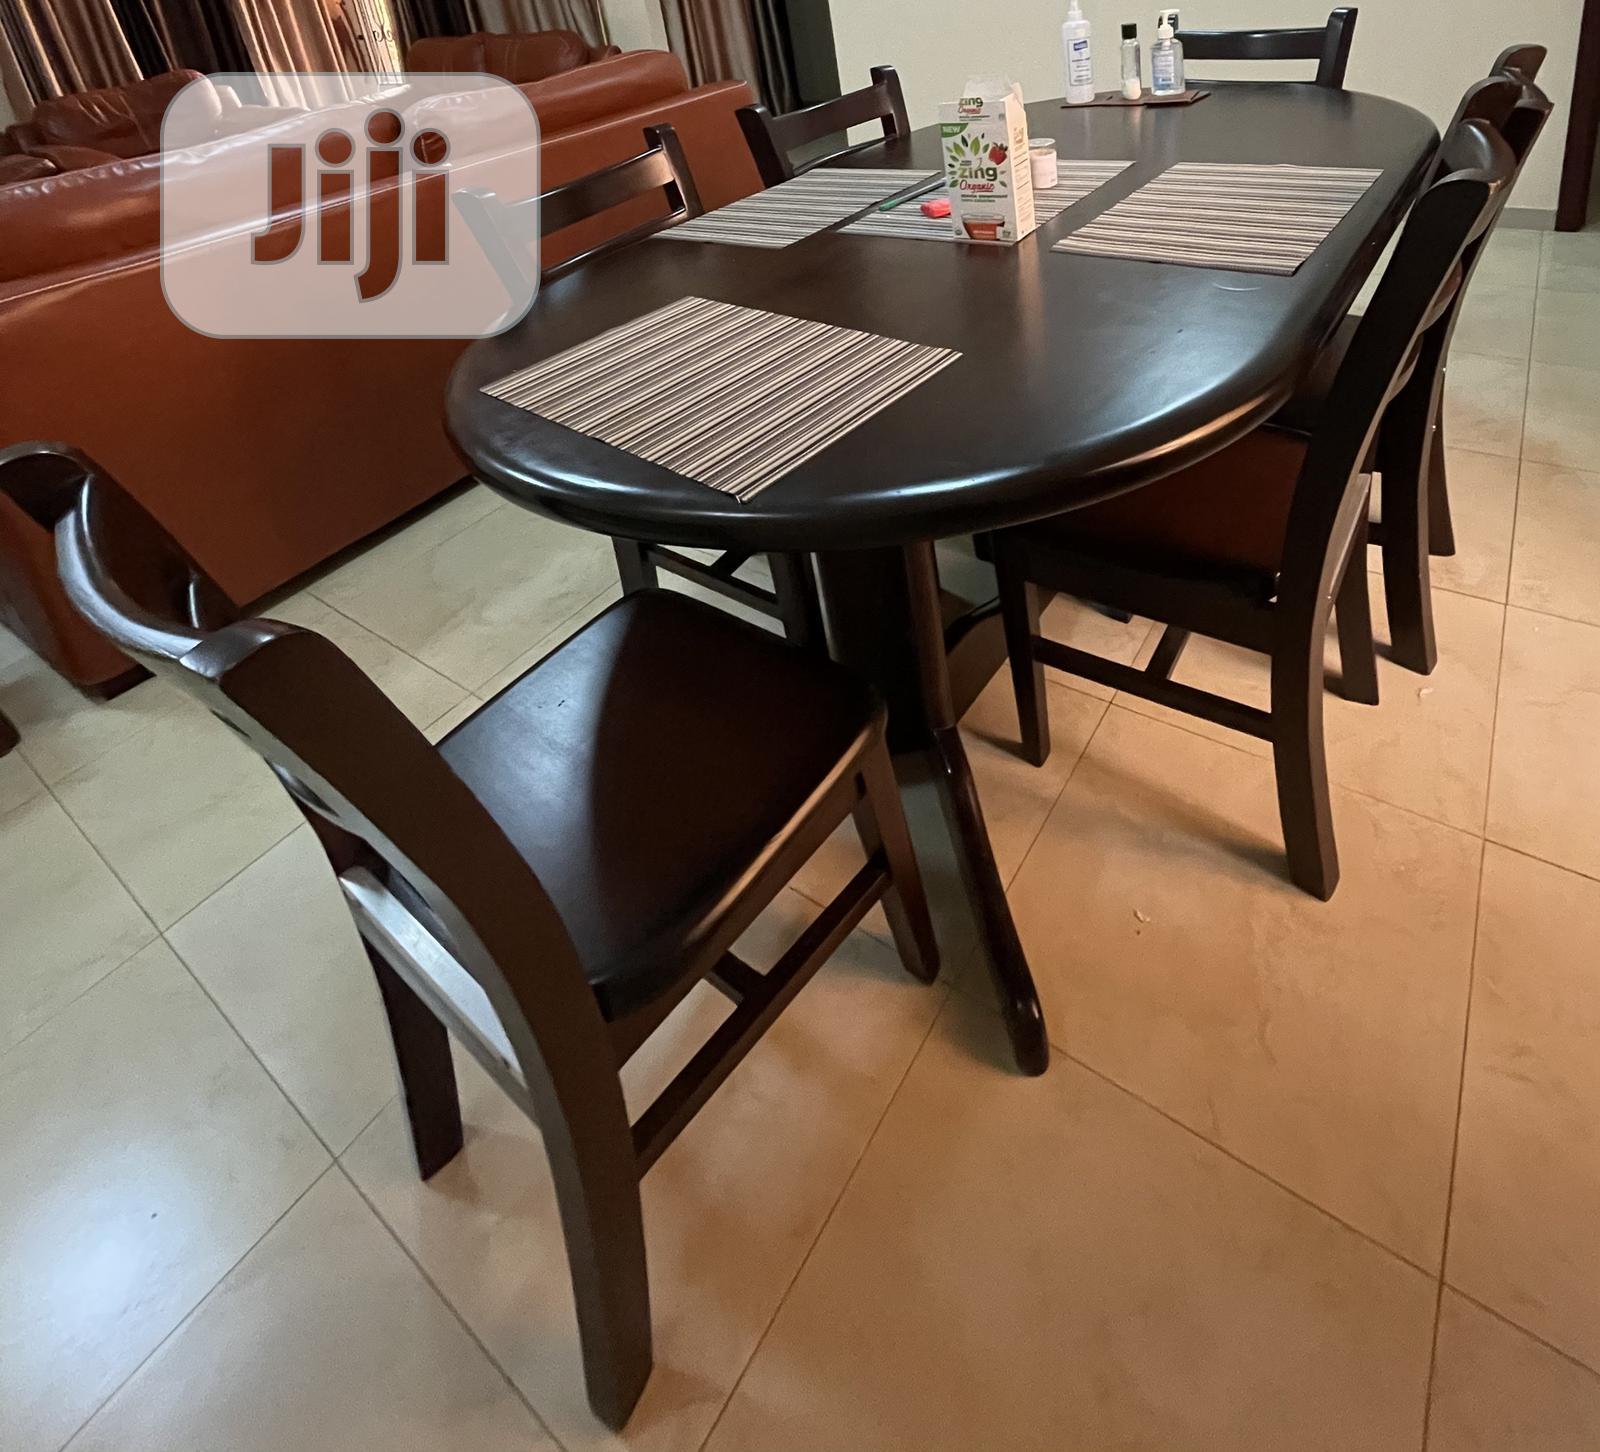 Dining Tables Six Chairs In Ibadan Furniture Naomass Nature Jiji Ng